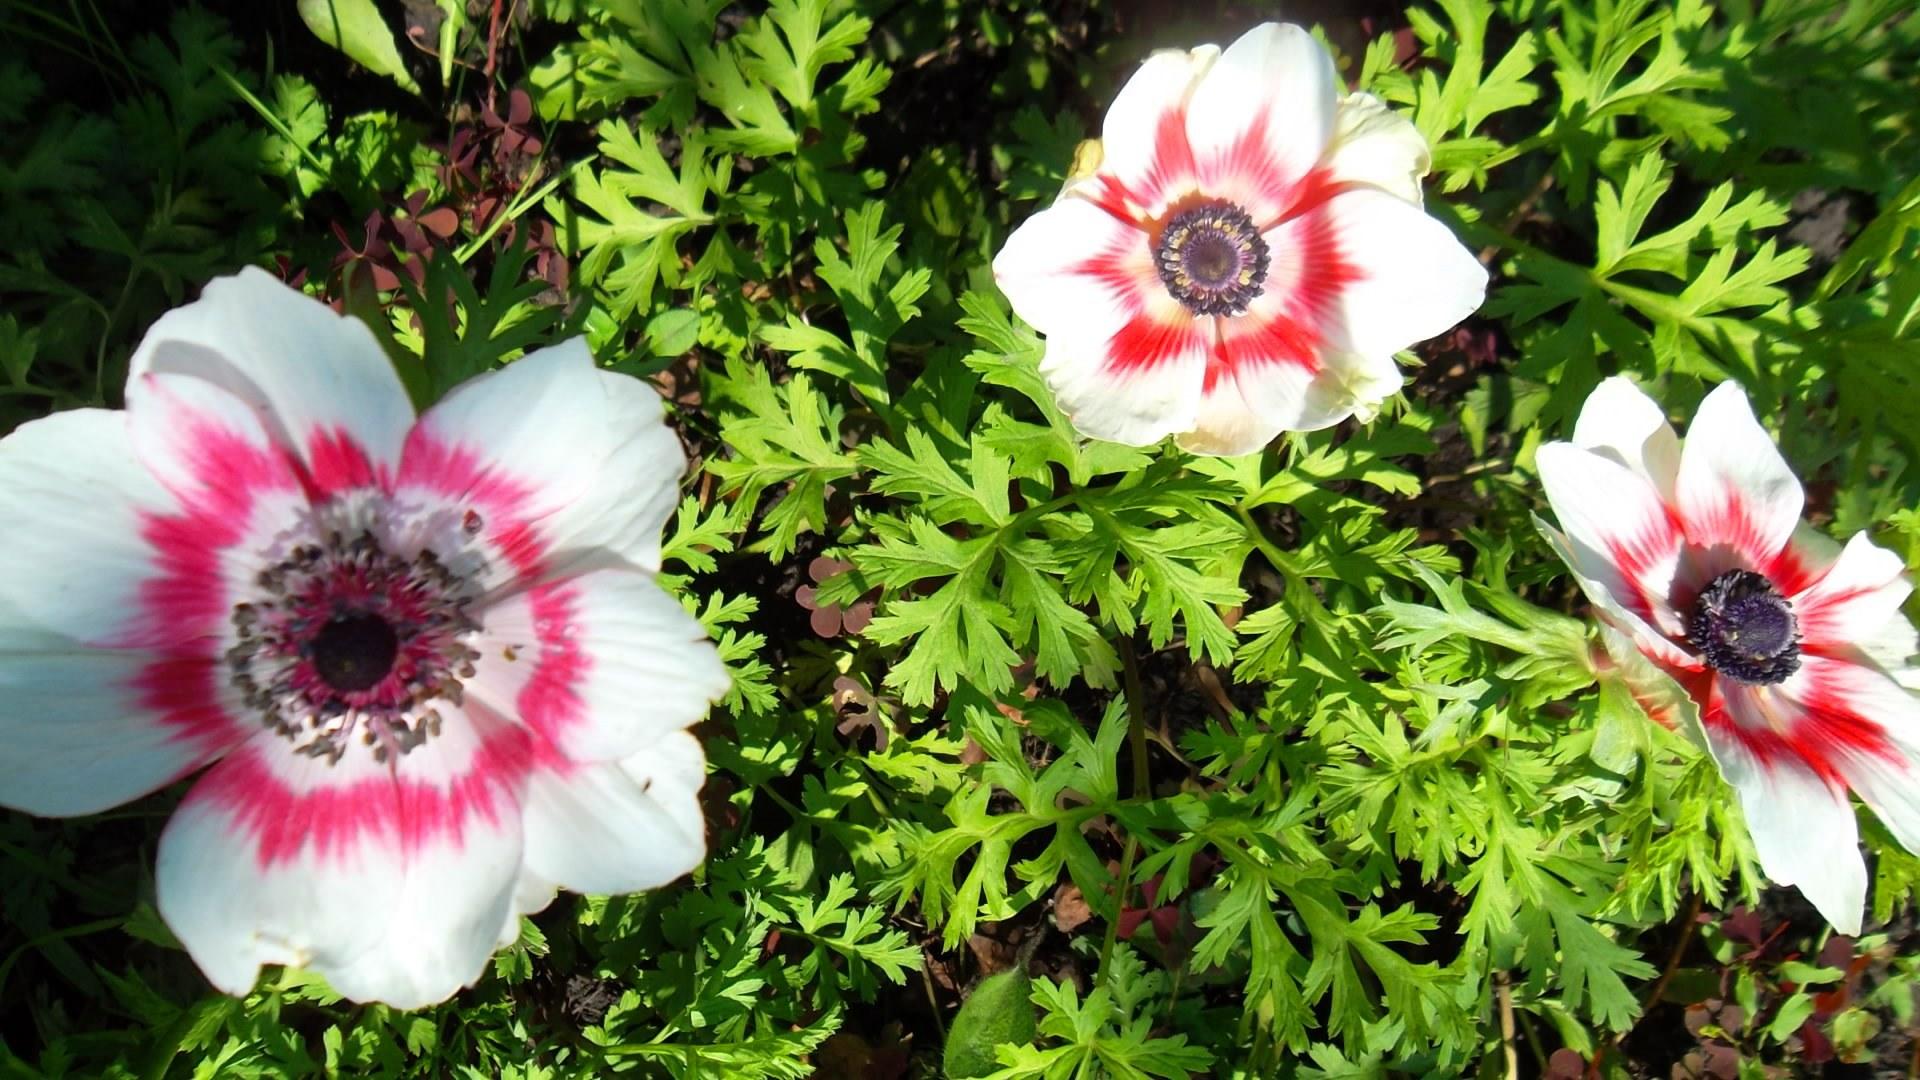 Цветы анемон посадка и уход